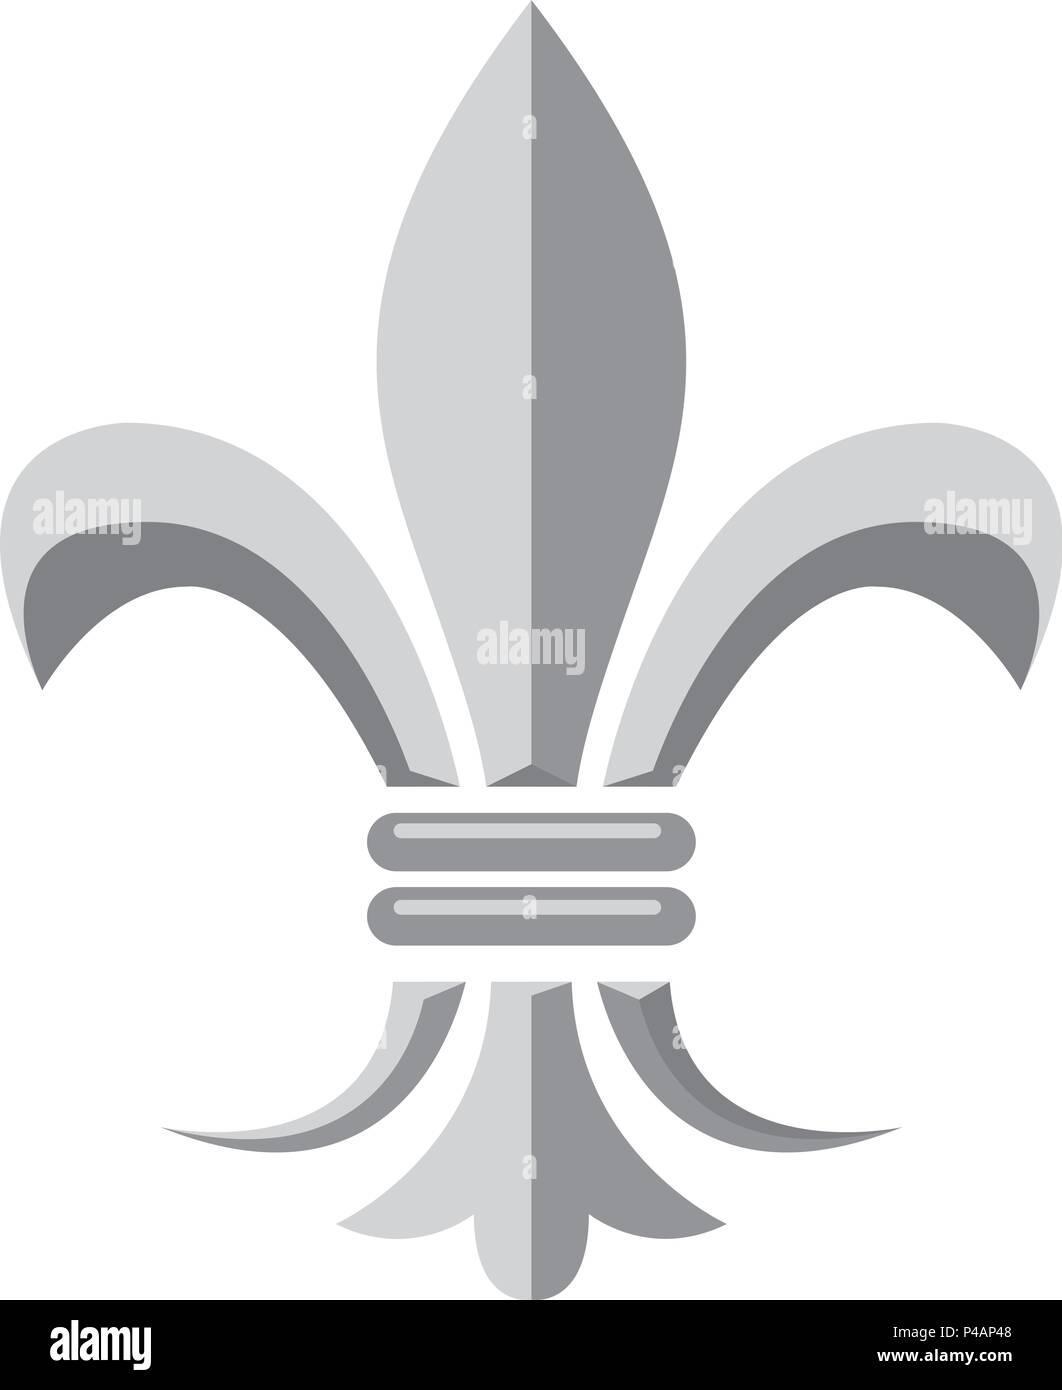 Fleur De Lis Heraldic Symbol Of French Royal Monarchy Stock Vector